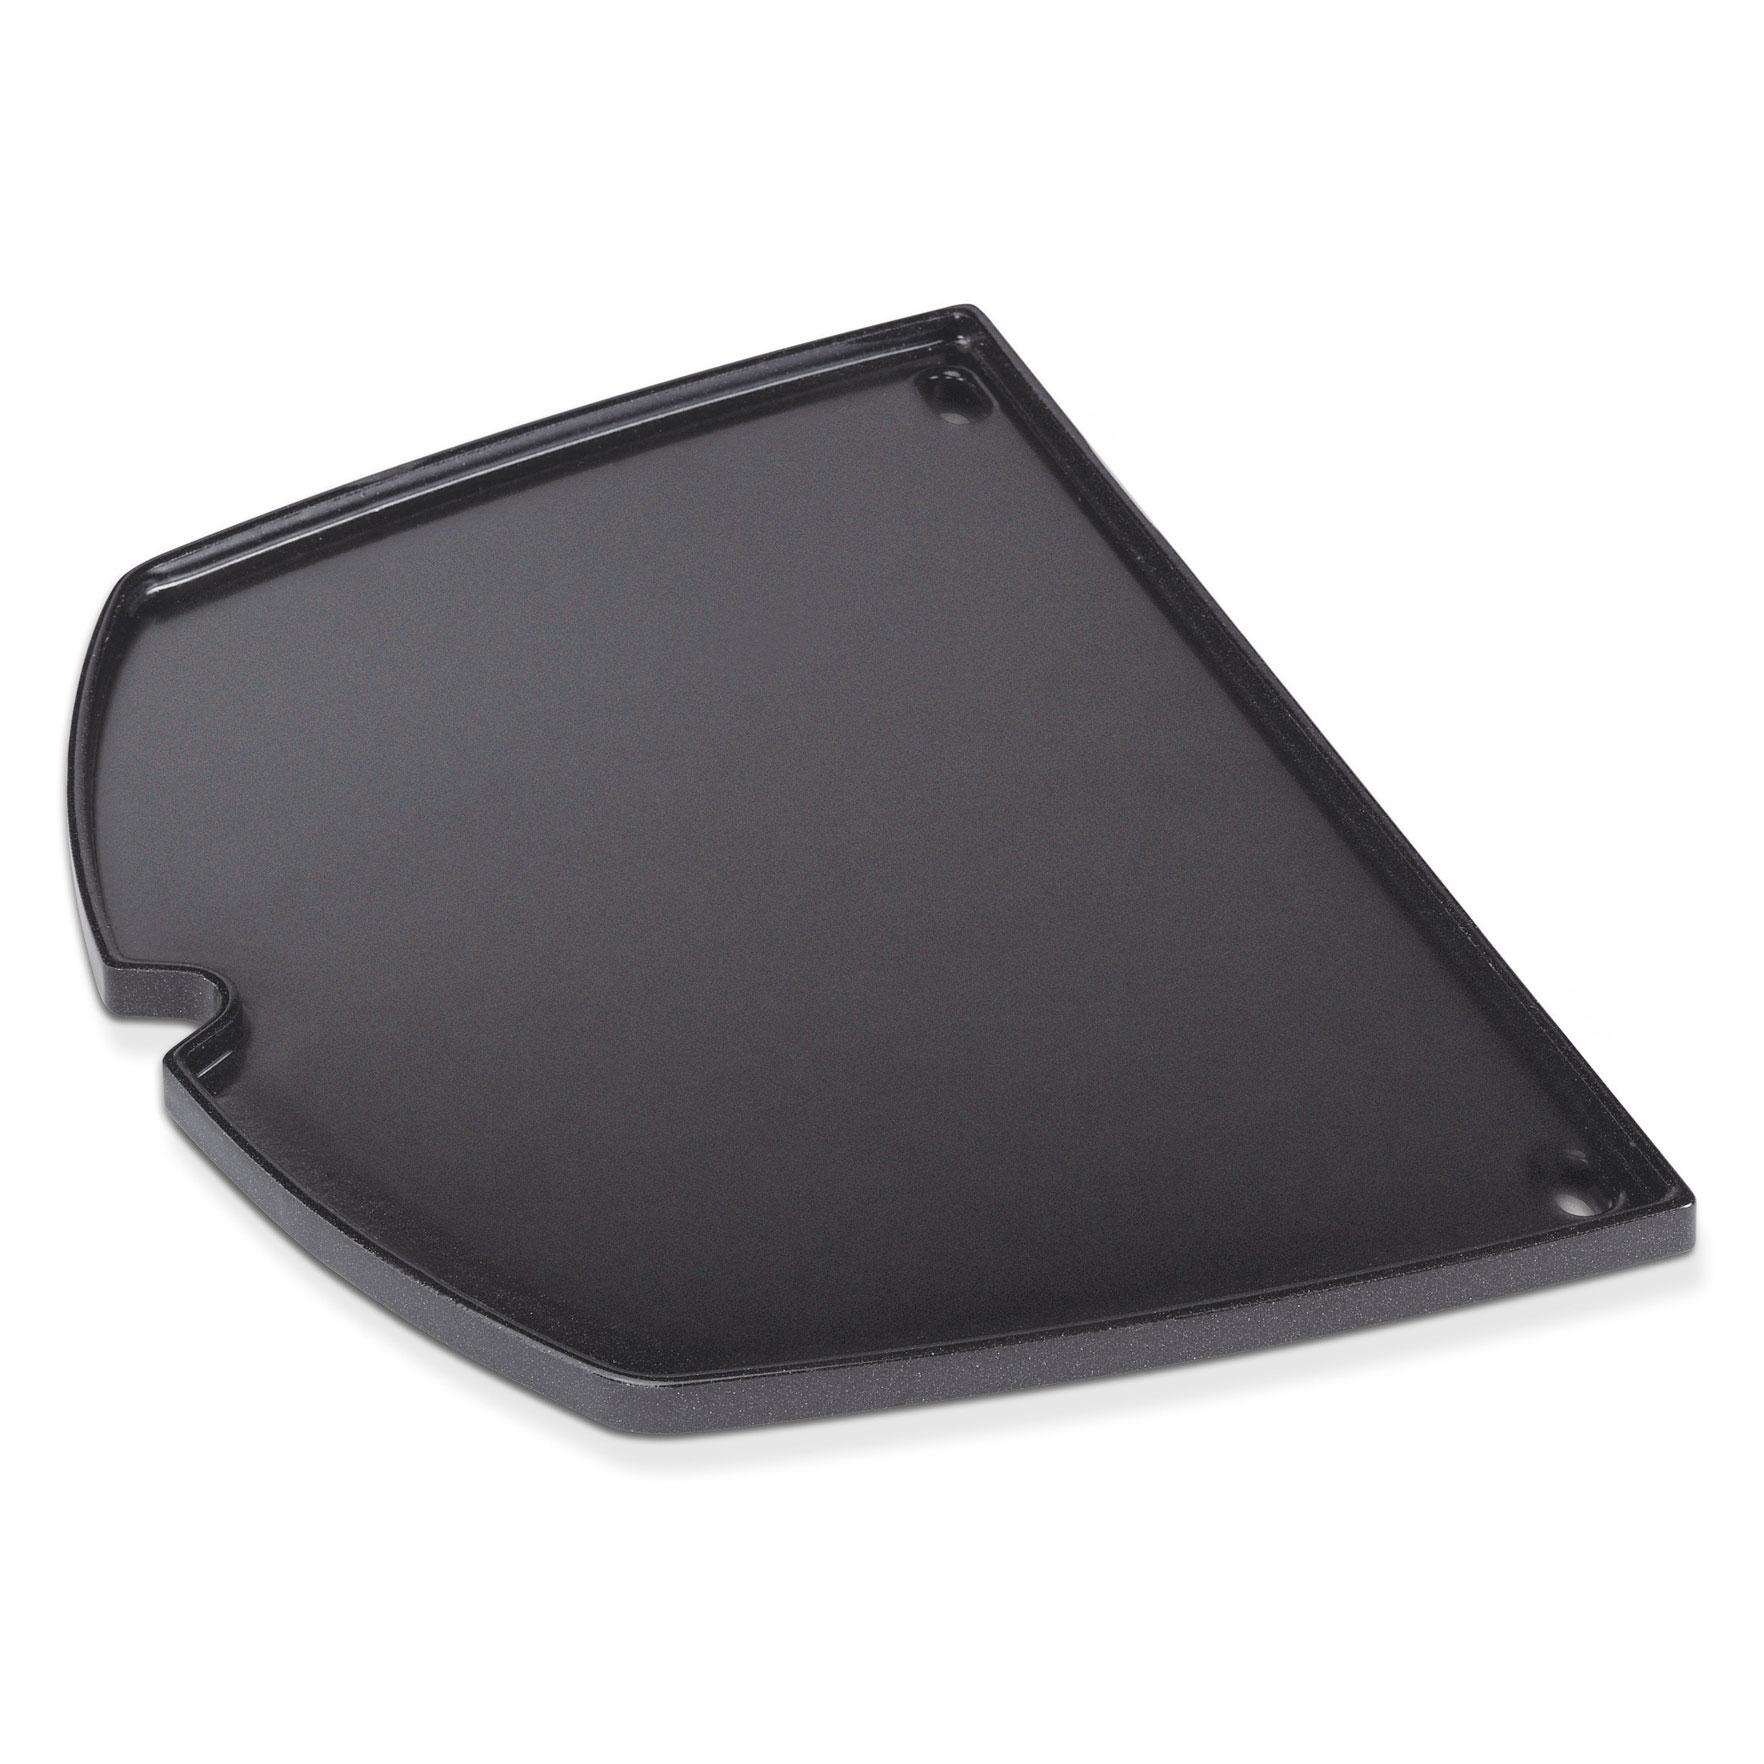 weber grillplatte f r gasgrill q1000 q1200 q1400 bei. Black Bedroom Furniture Sets. Home Design Ideas